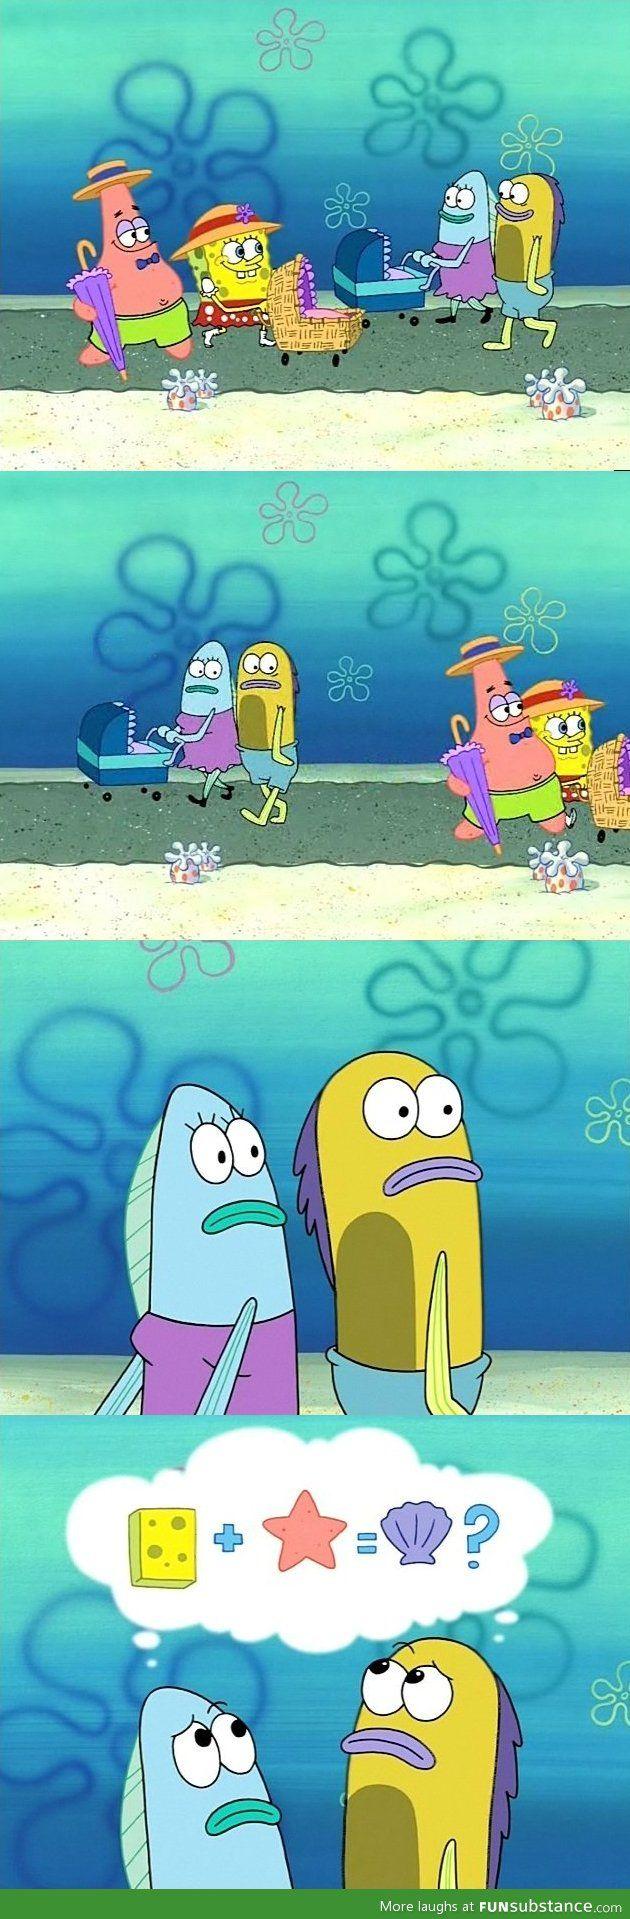 Spongebob Rock A Bye Bivalve Rock-a-bye bivalveSpongebob Rock A Bye Bivalve Gif